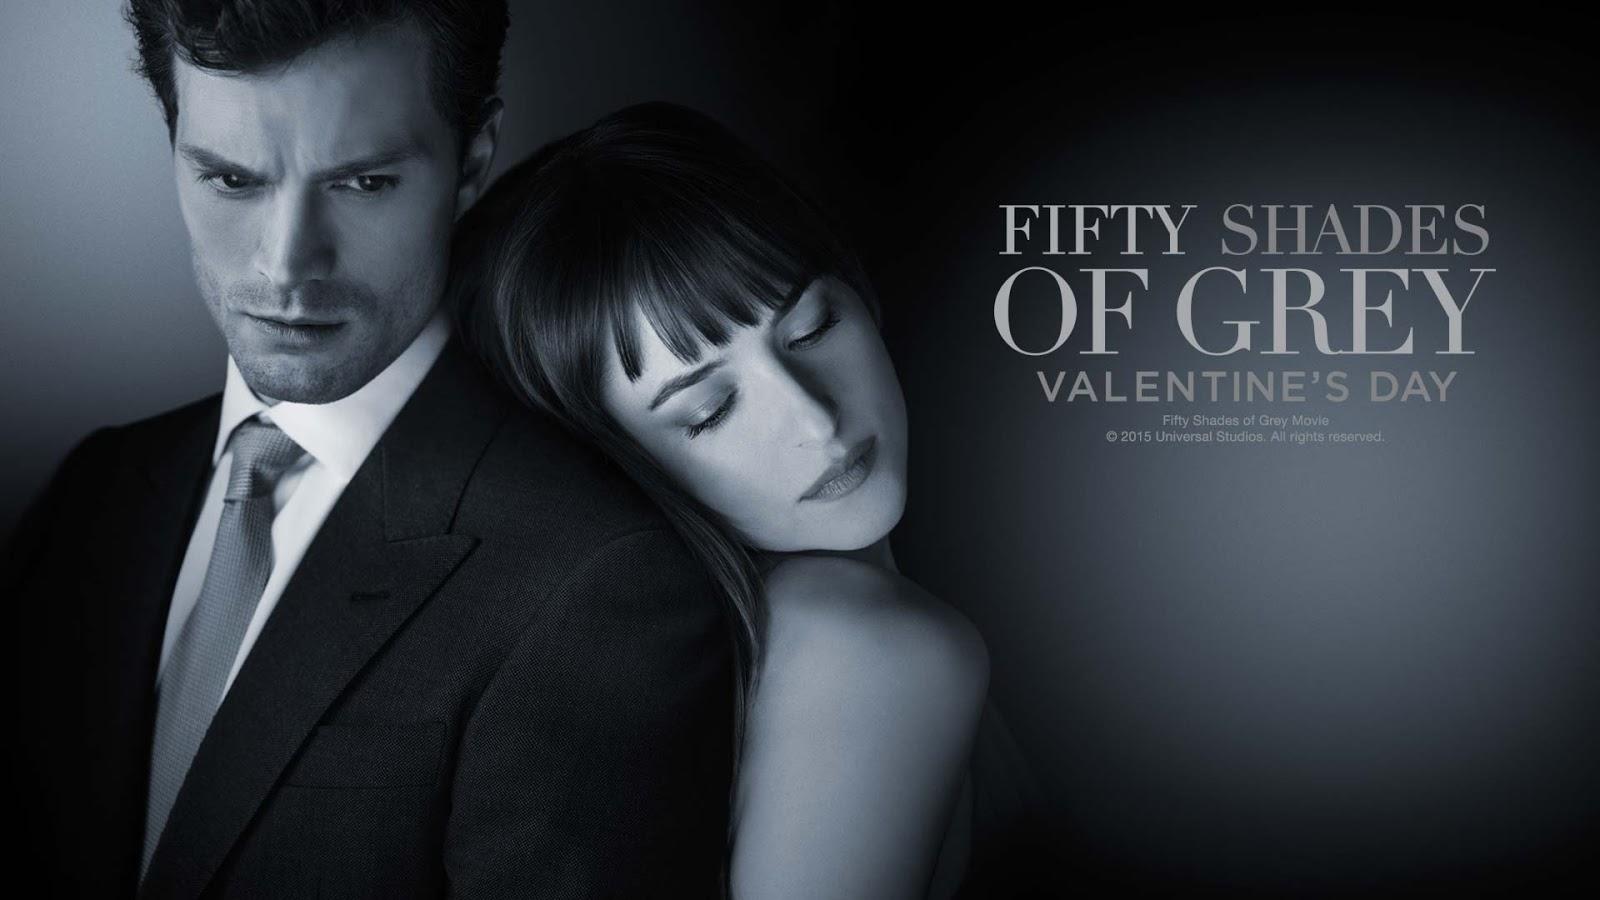 50 shades of grey full movie sub indo